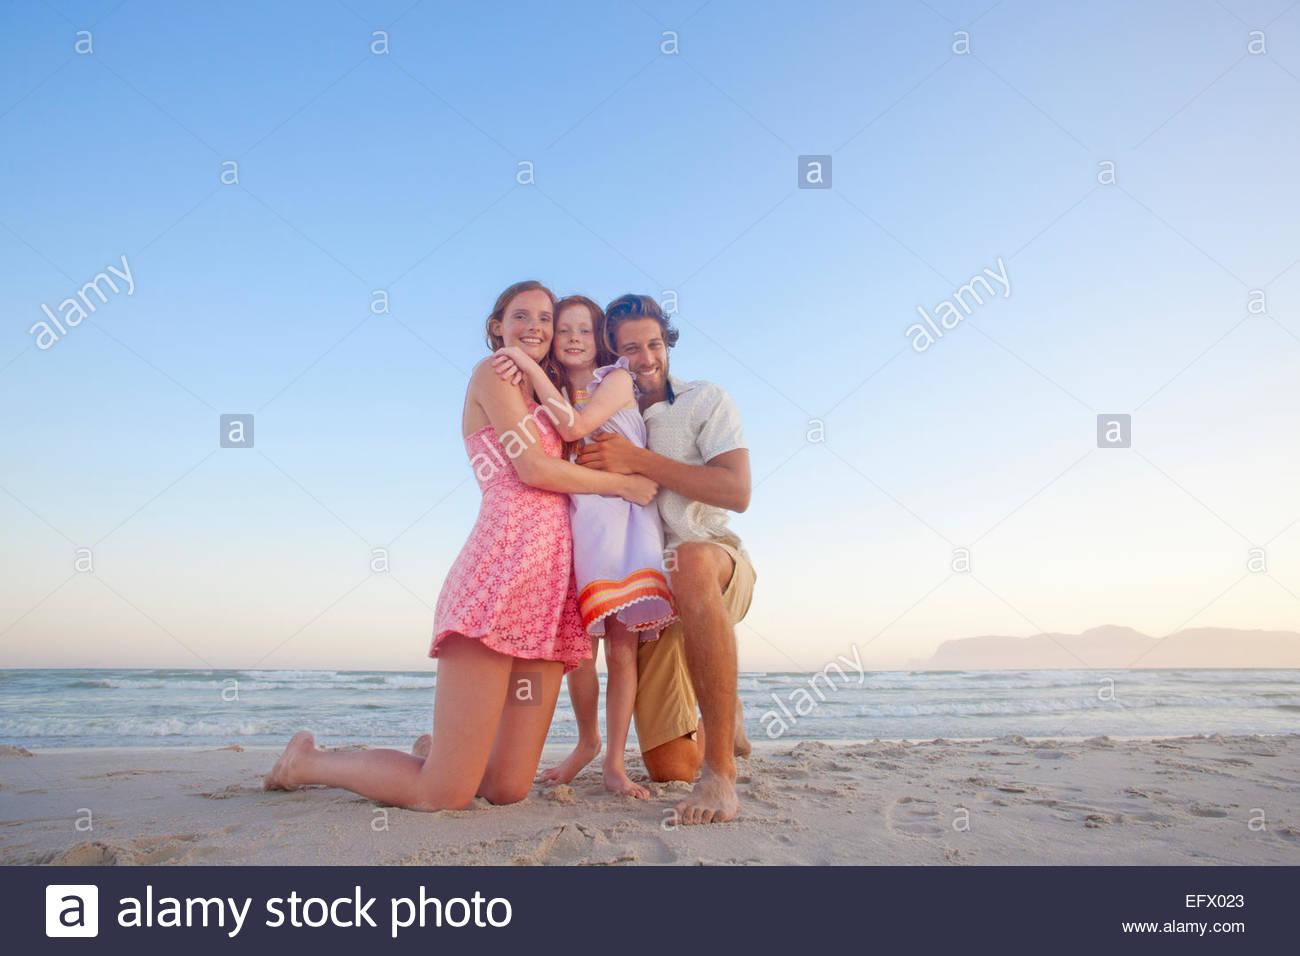 Happy couple kneeling, hugging daughter, on sunny beach - Stock Image